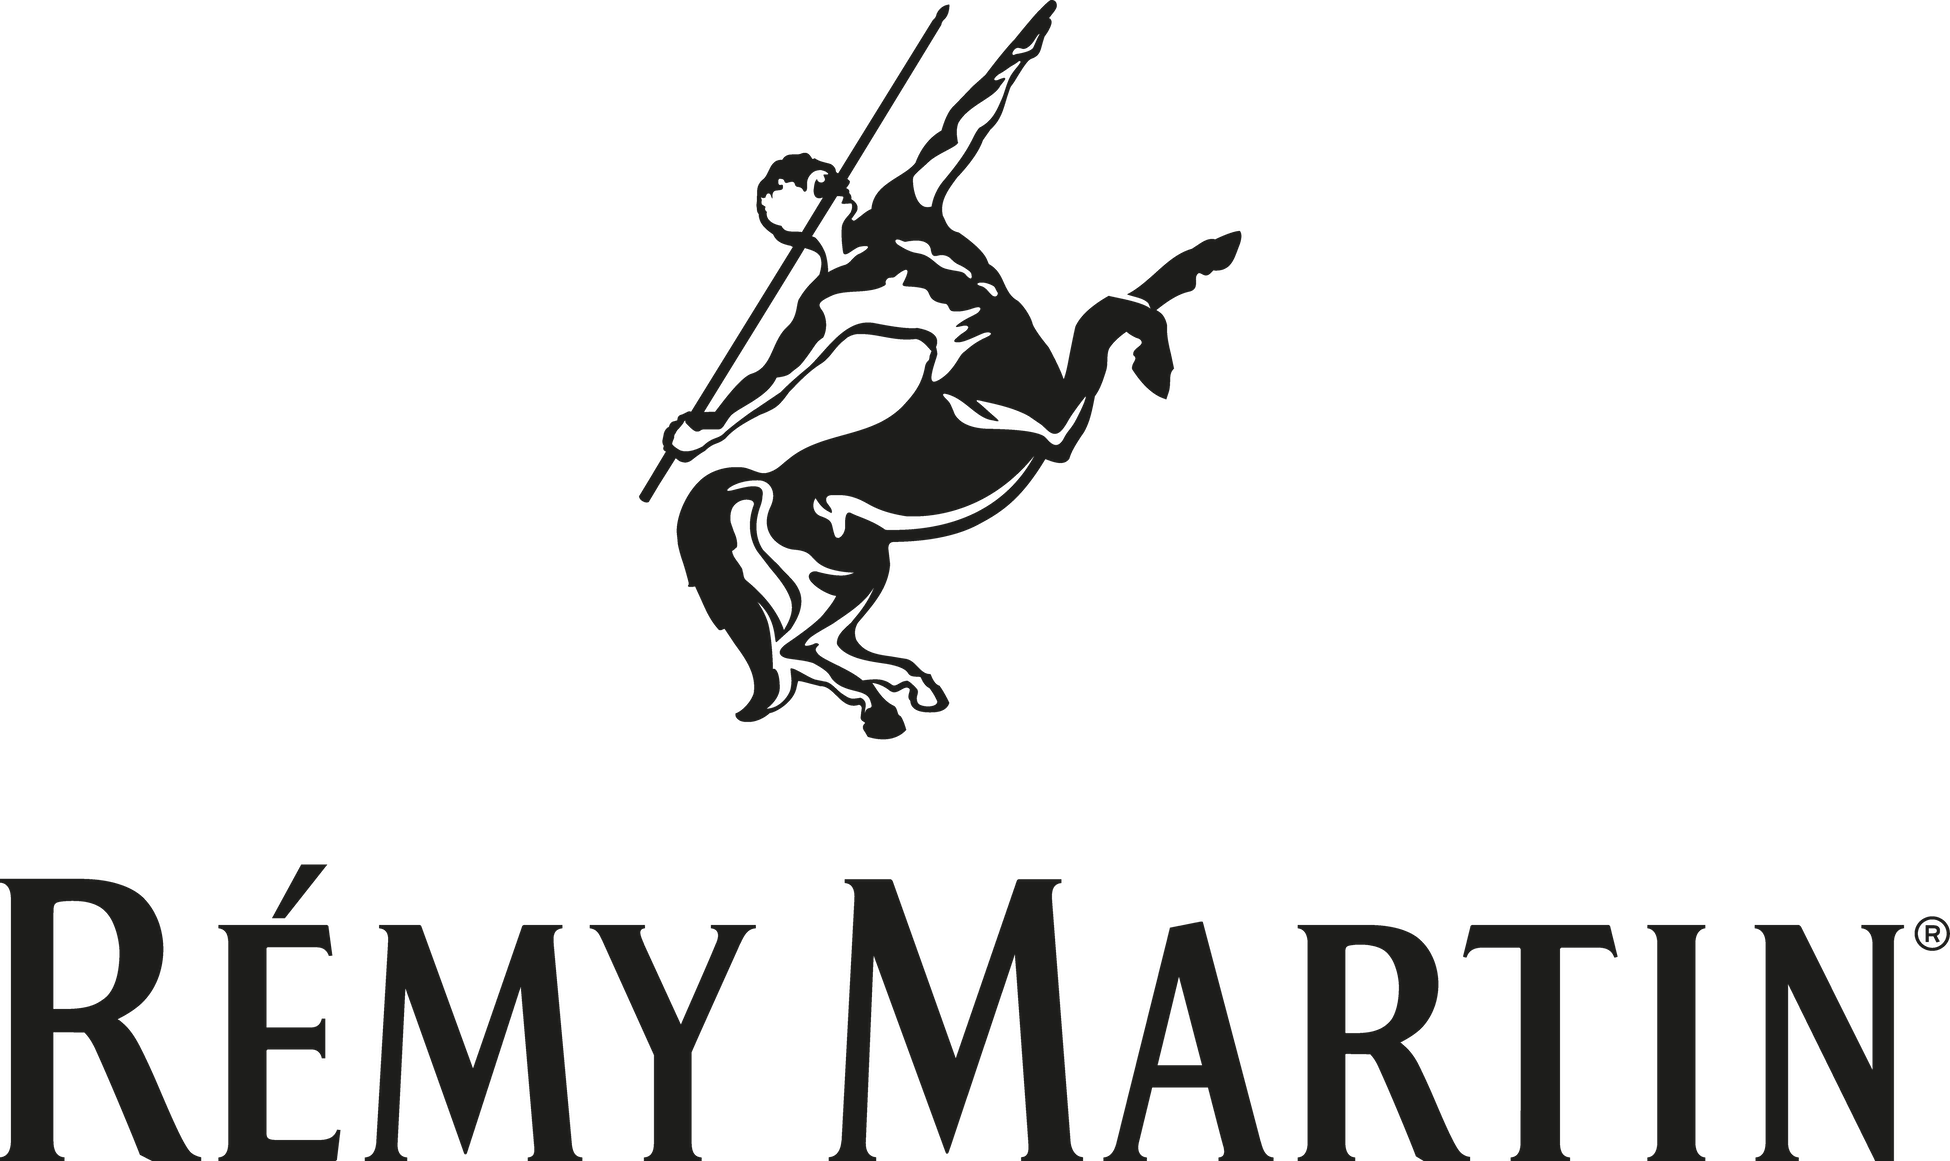 Remy Martin-Document-RM_CENTAURE_LOGO_Verti_Top_BLACK.png